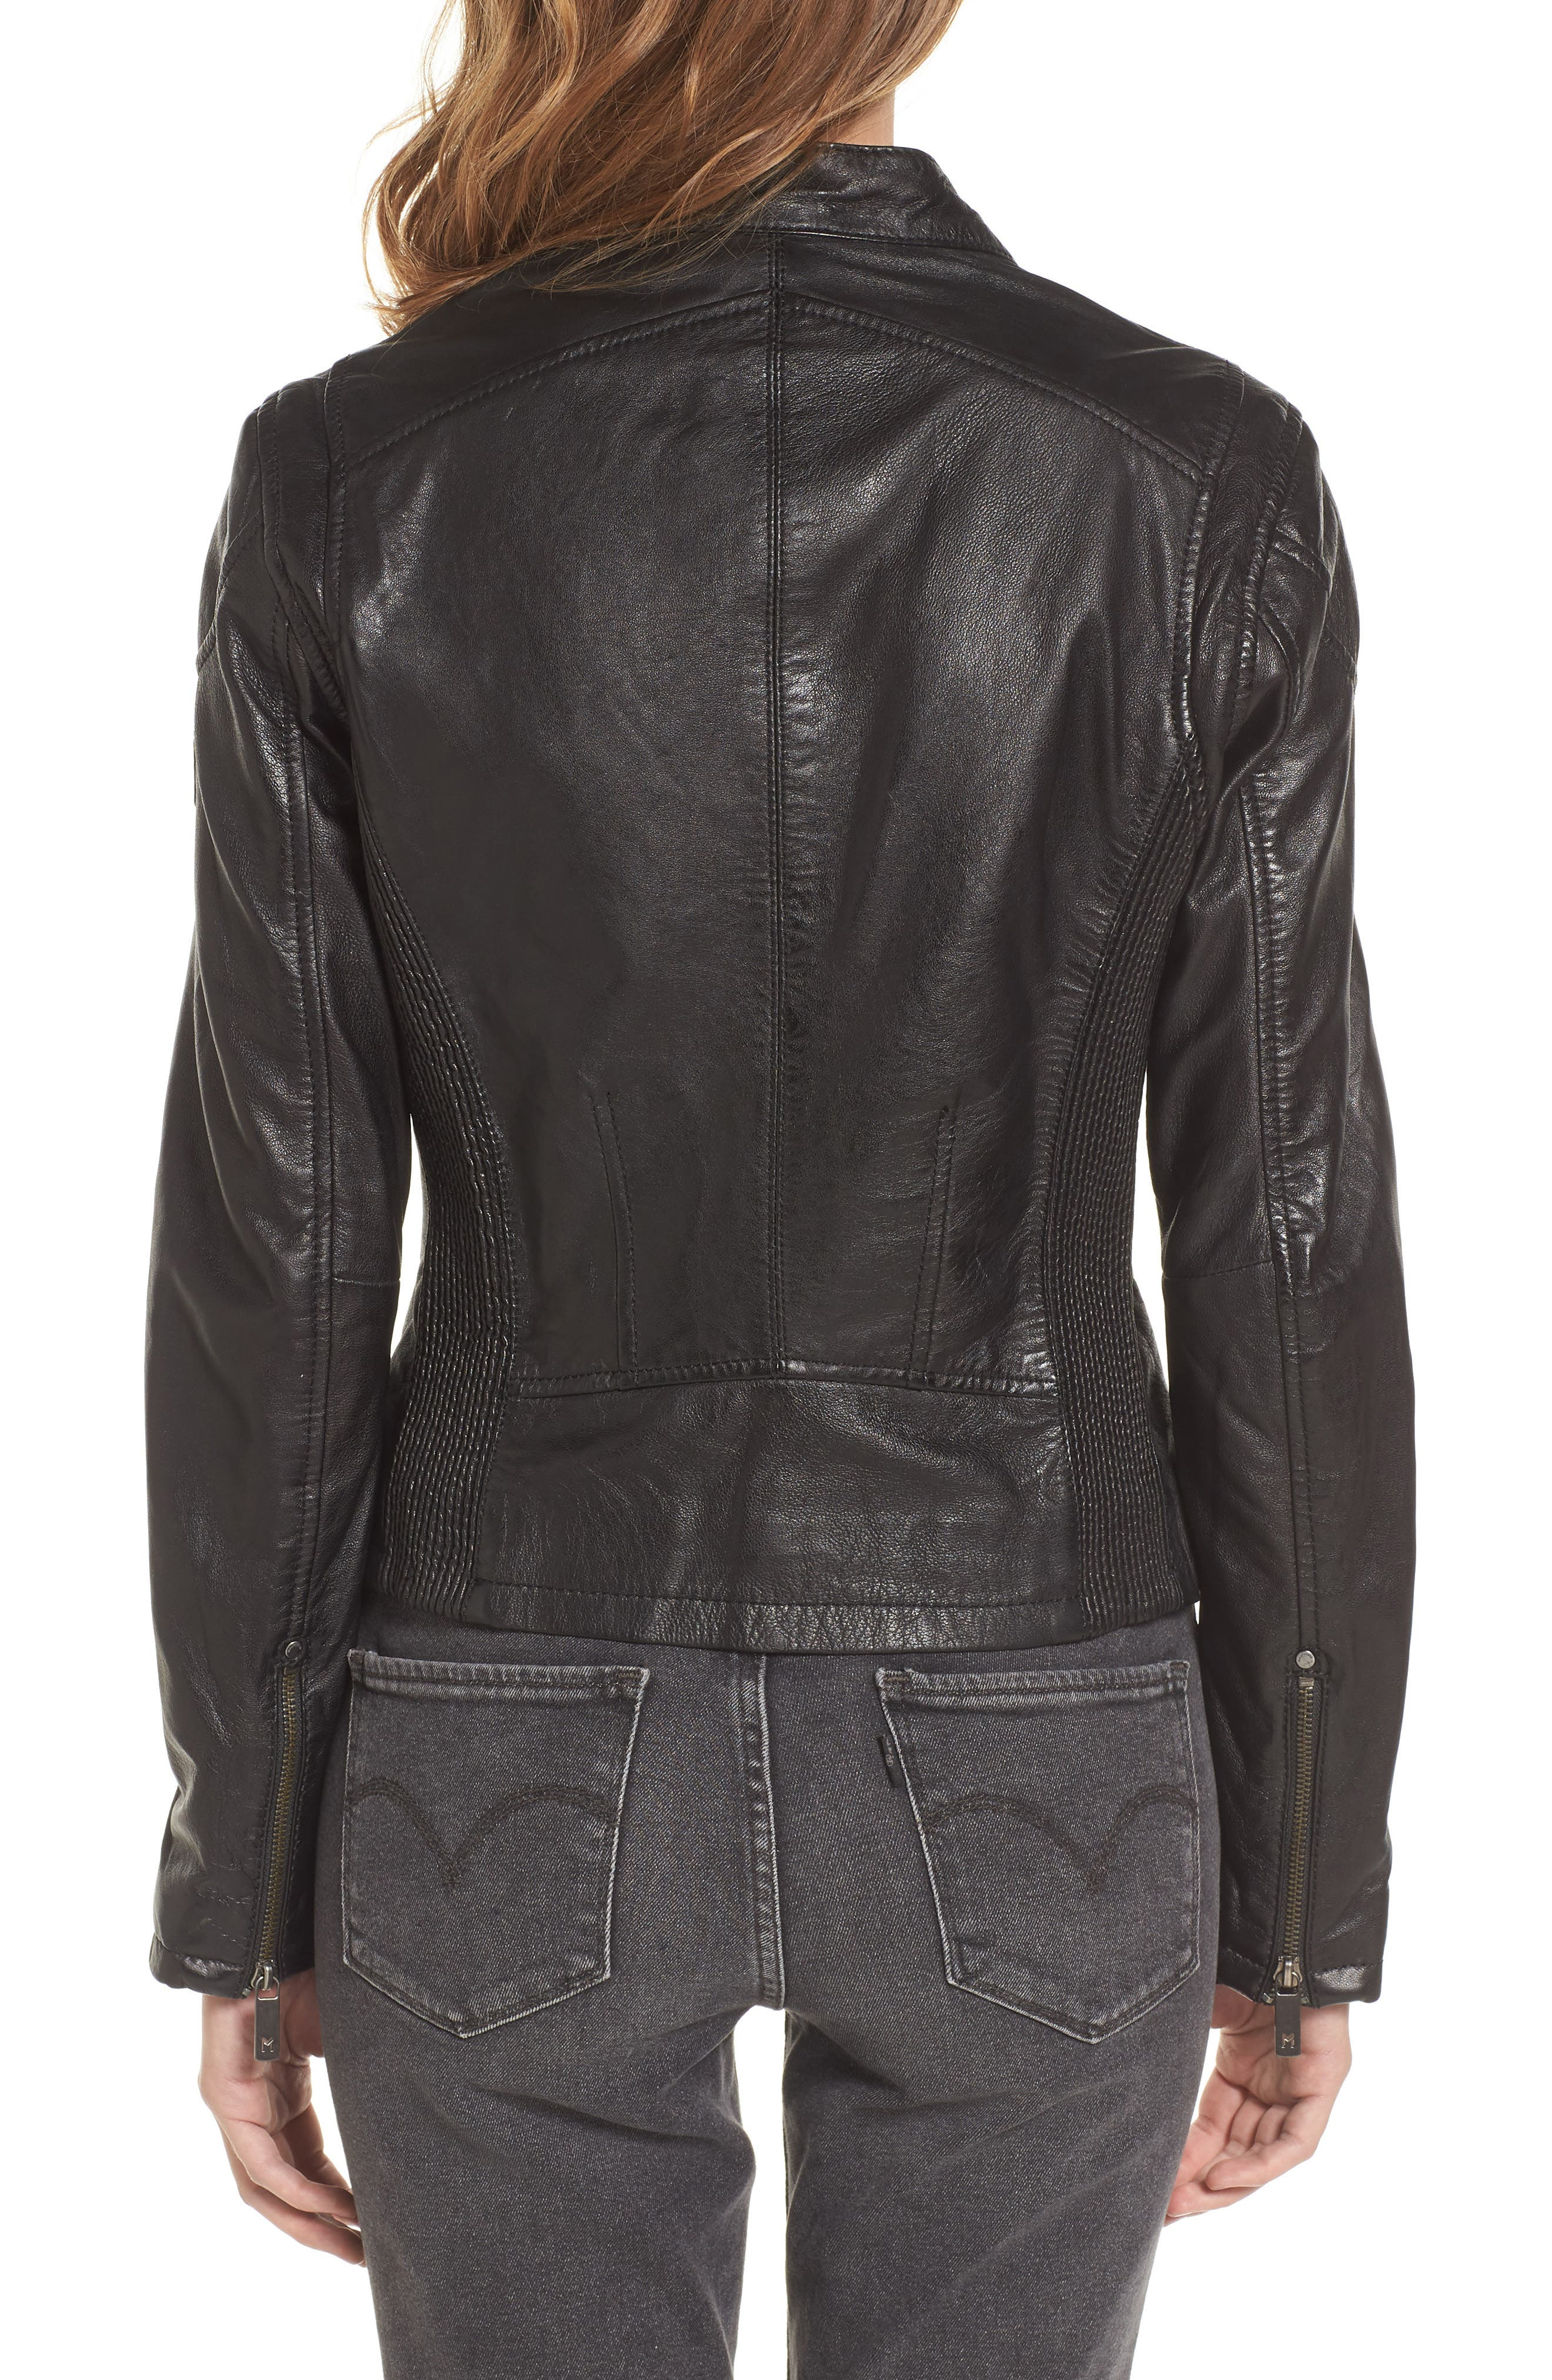 MAURITIUS, Leather Lambskin Leather Moto Jacket, Alternate thumbnail 2, color, 001